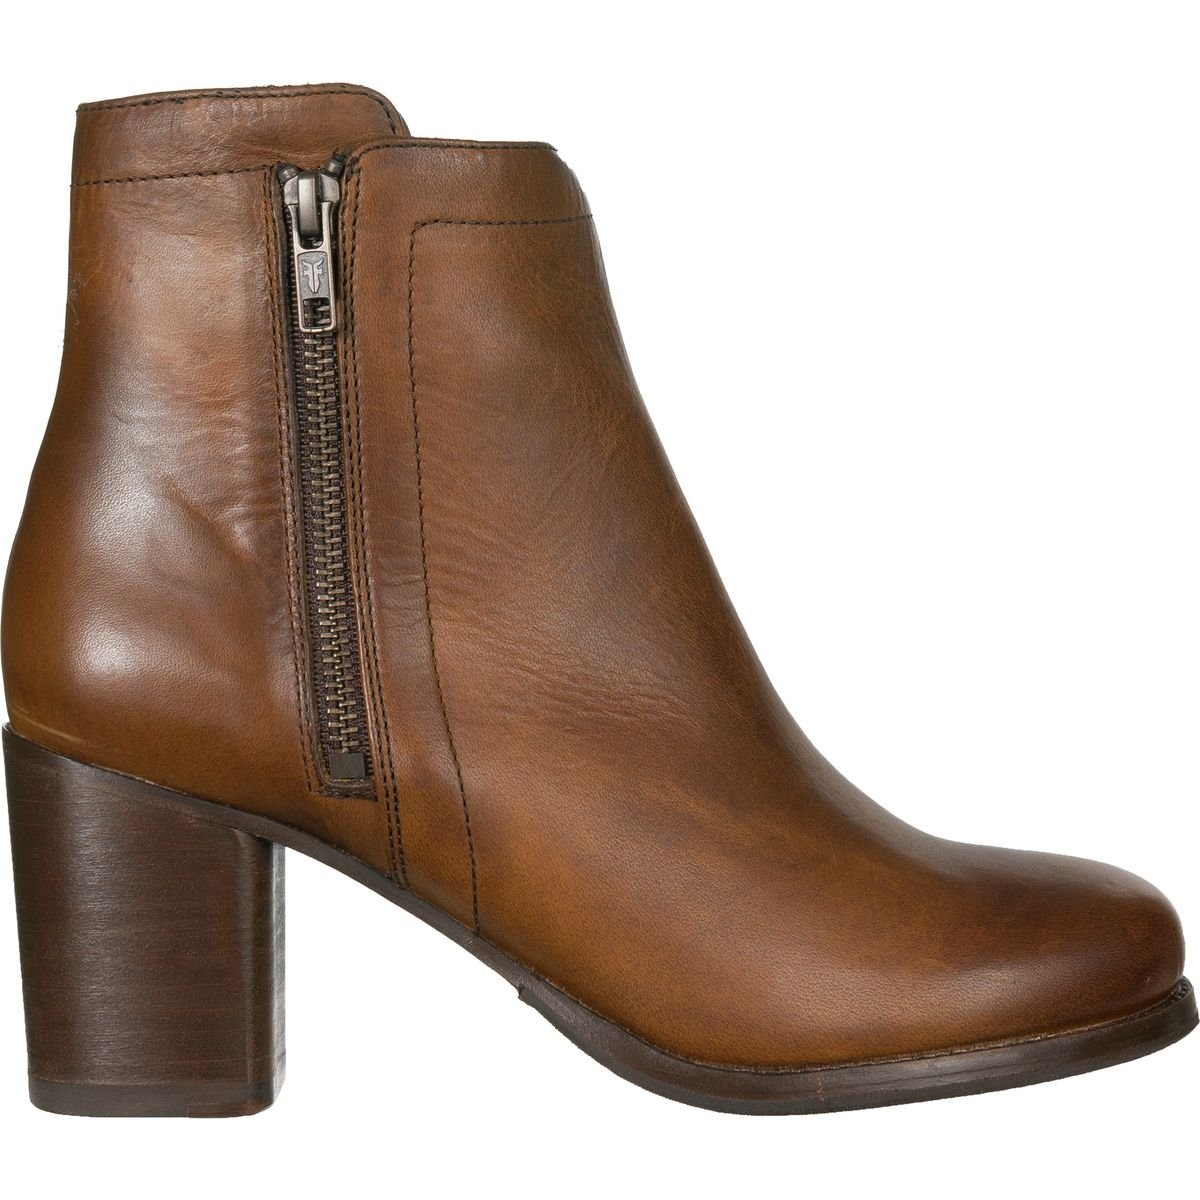 FRYE Women's Addie Double Zip Boot, Whiskey Oil Tanned Full Grain, 6 M US